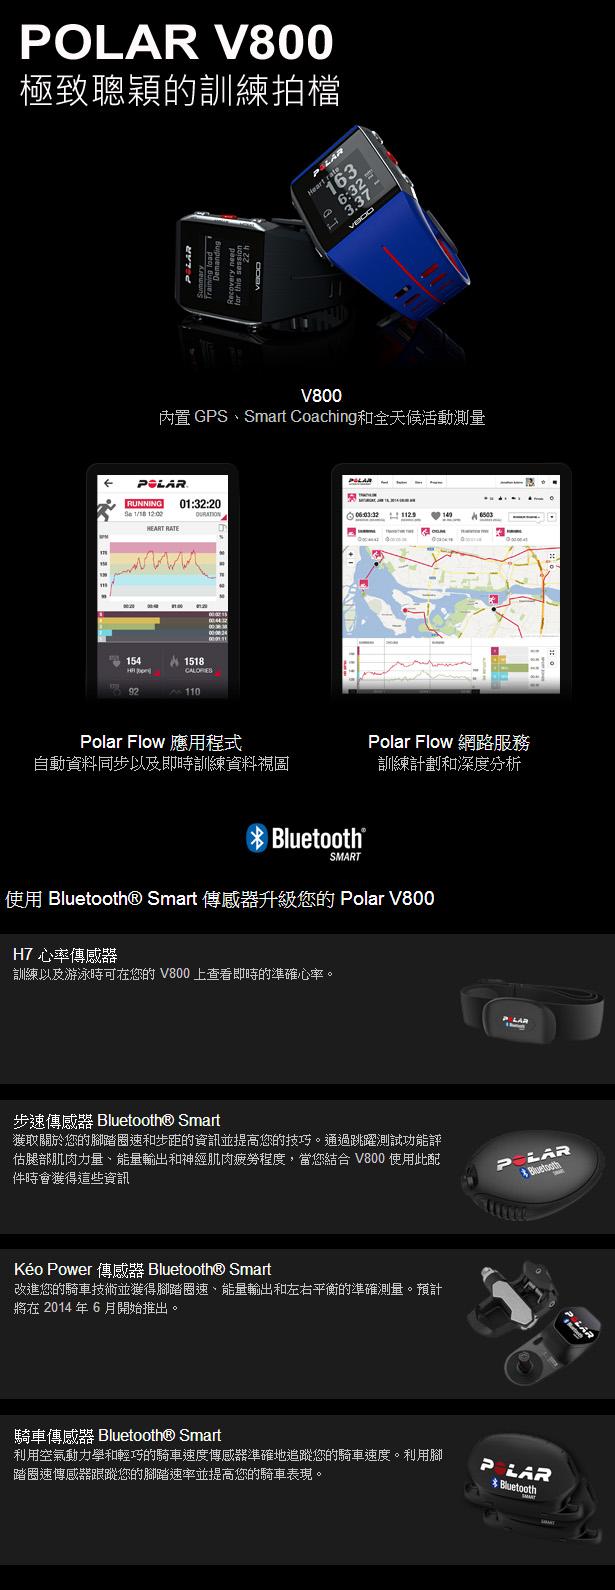 V800 GPS運動心率錶